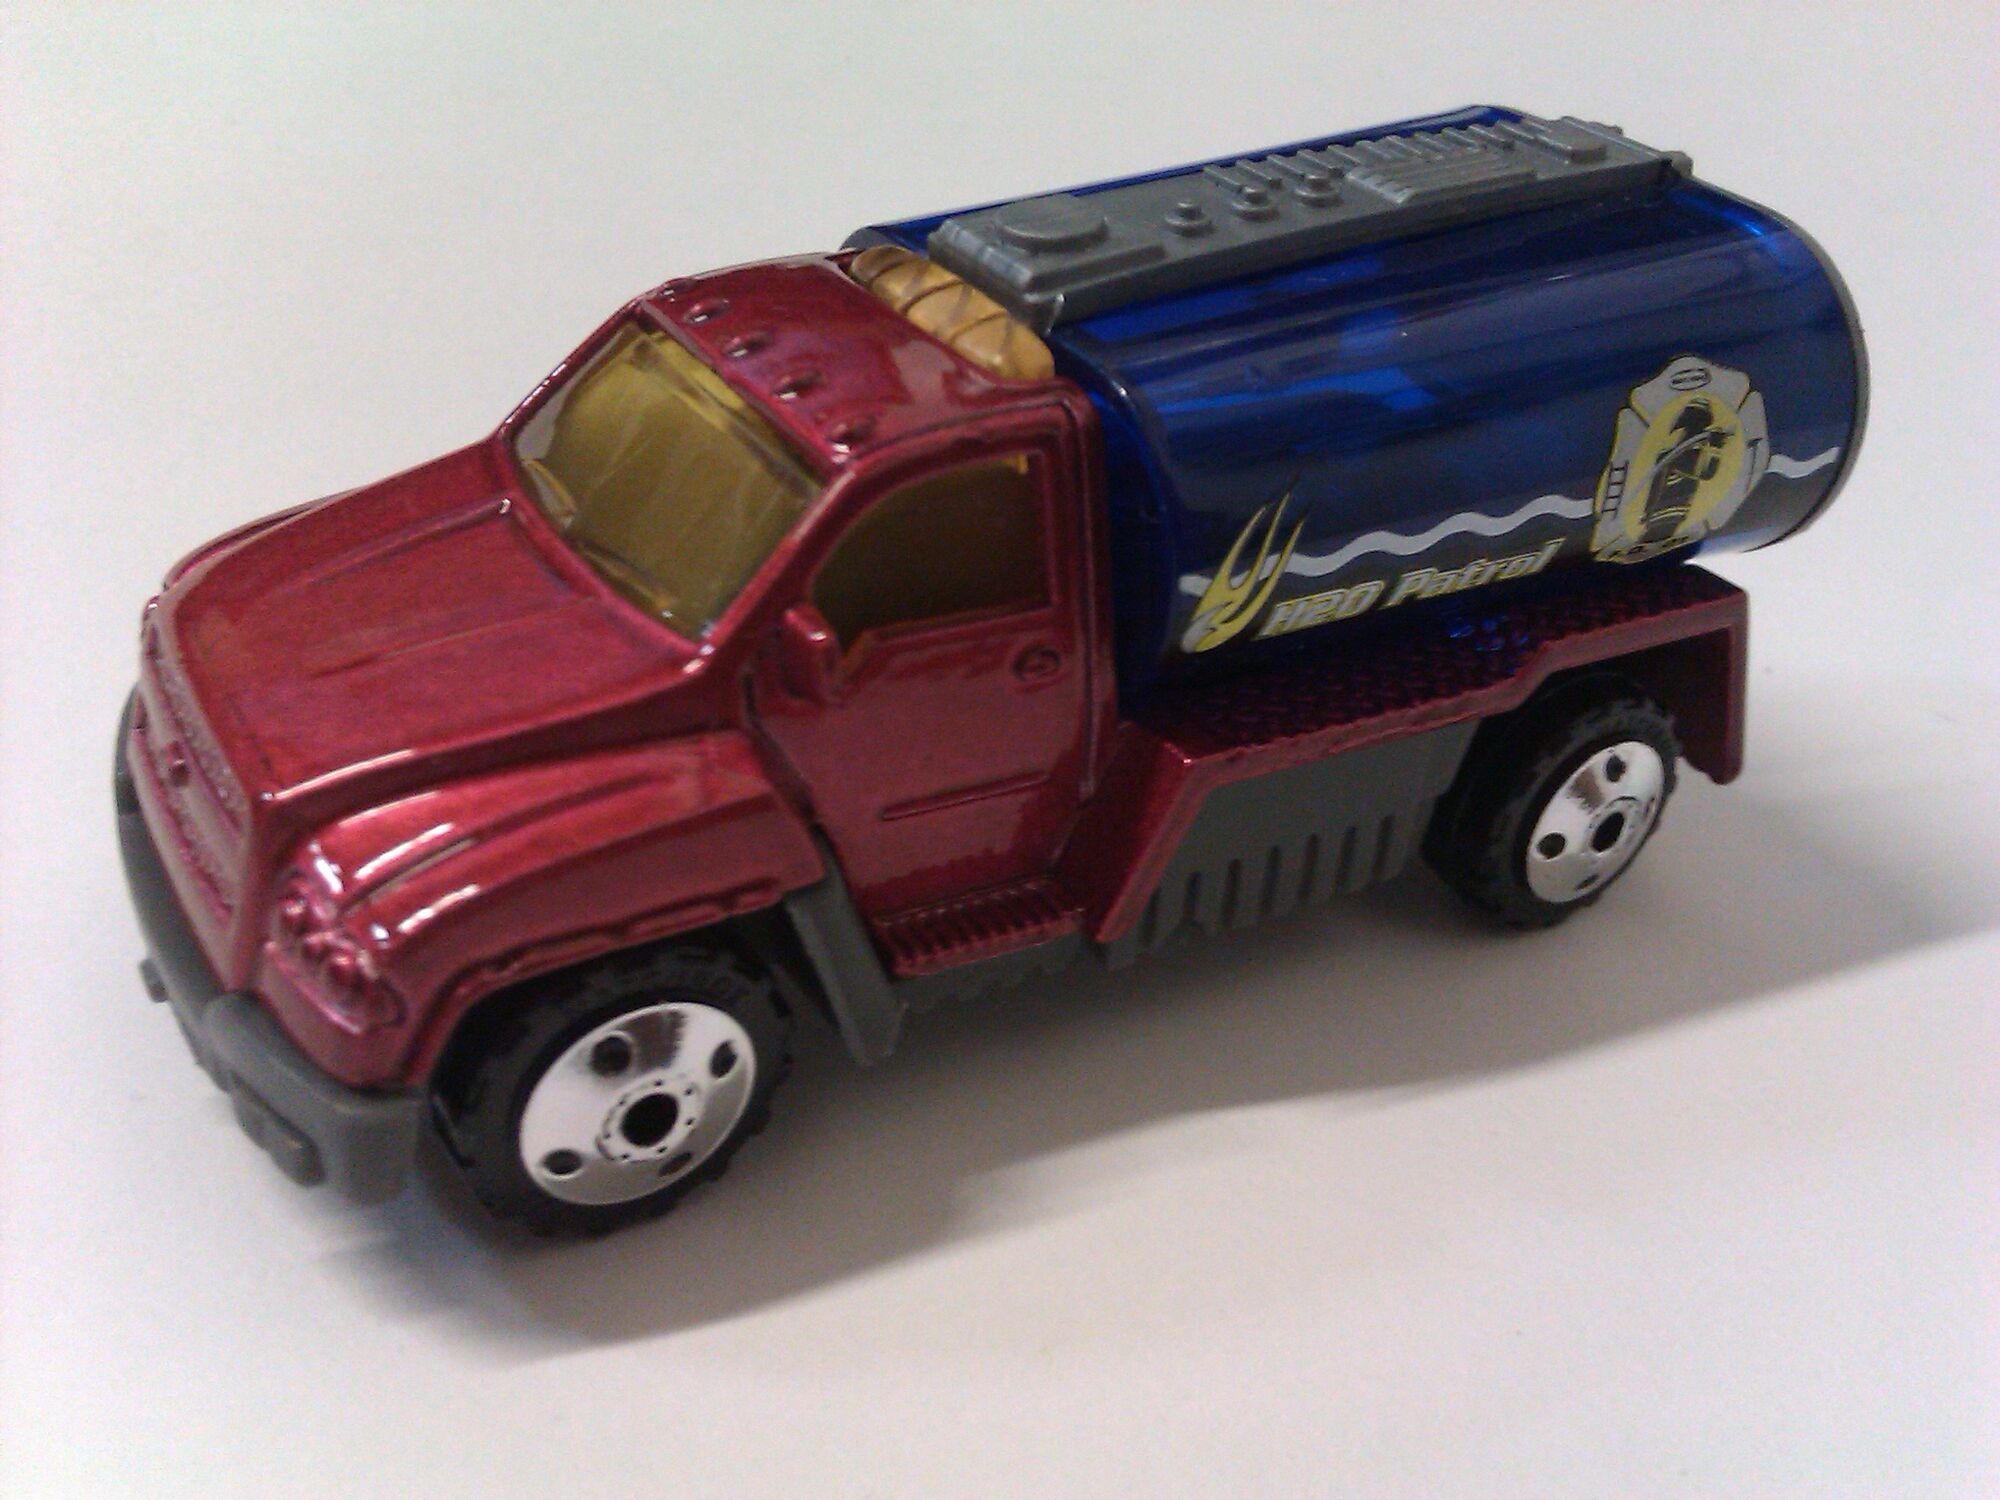 Tanker Truck | Matchbox Cars Wiki | Fandom powered by Wikia